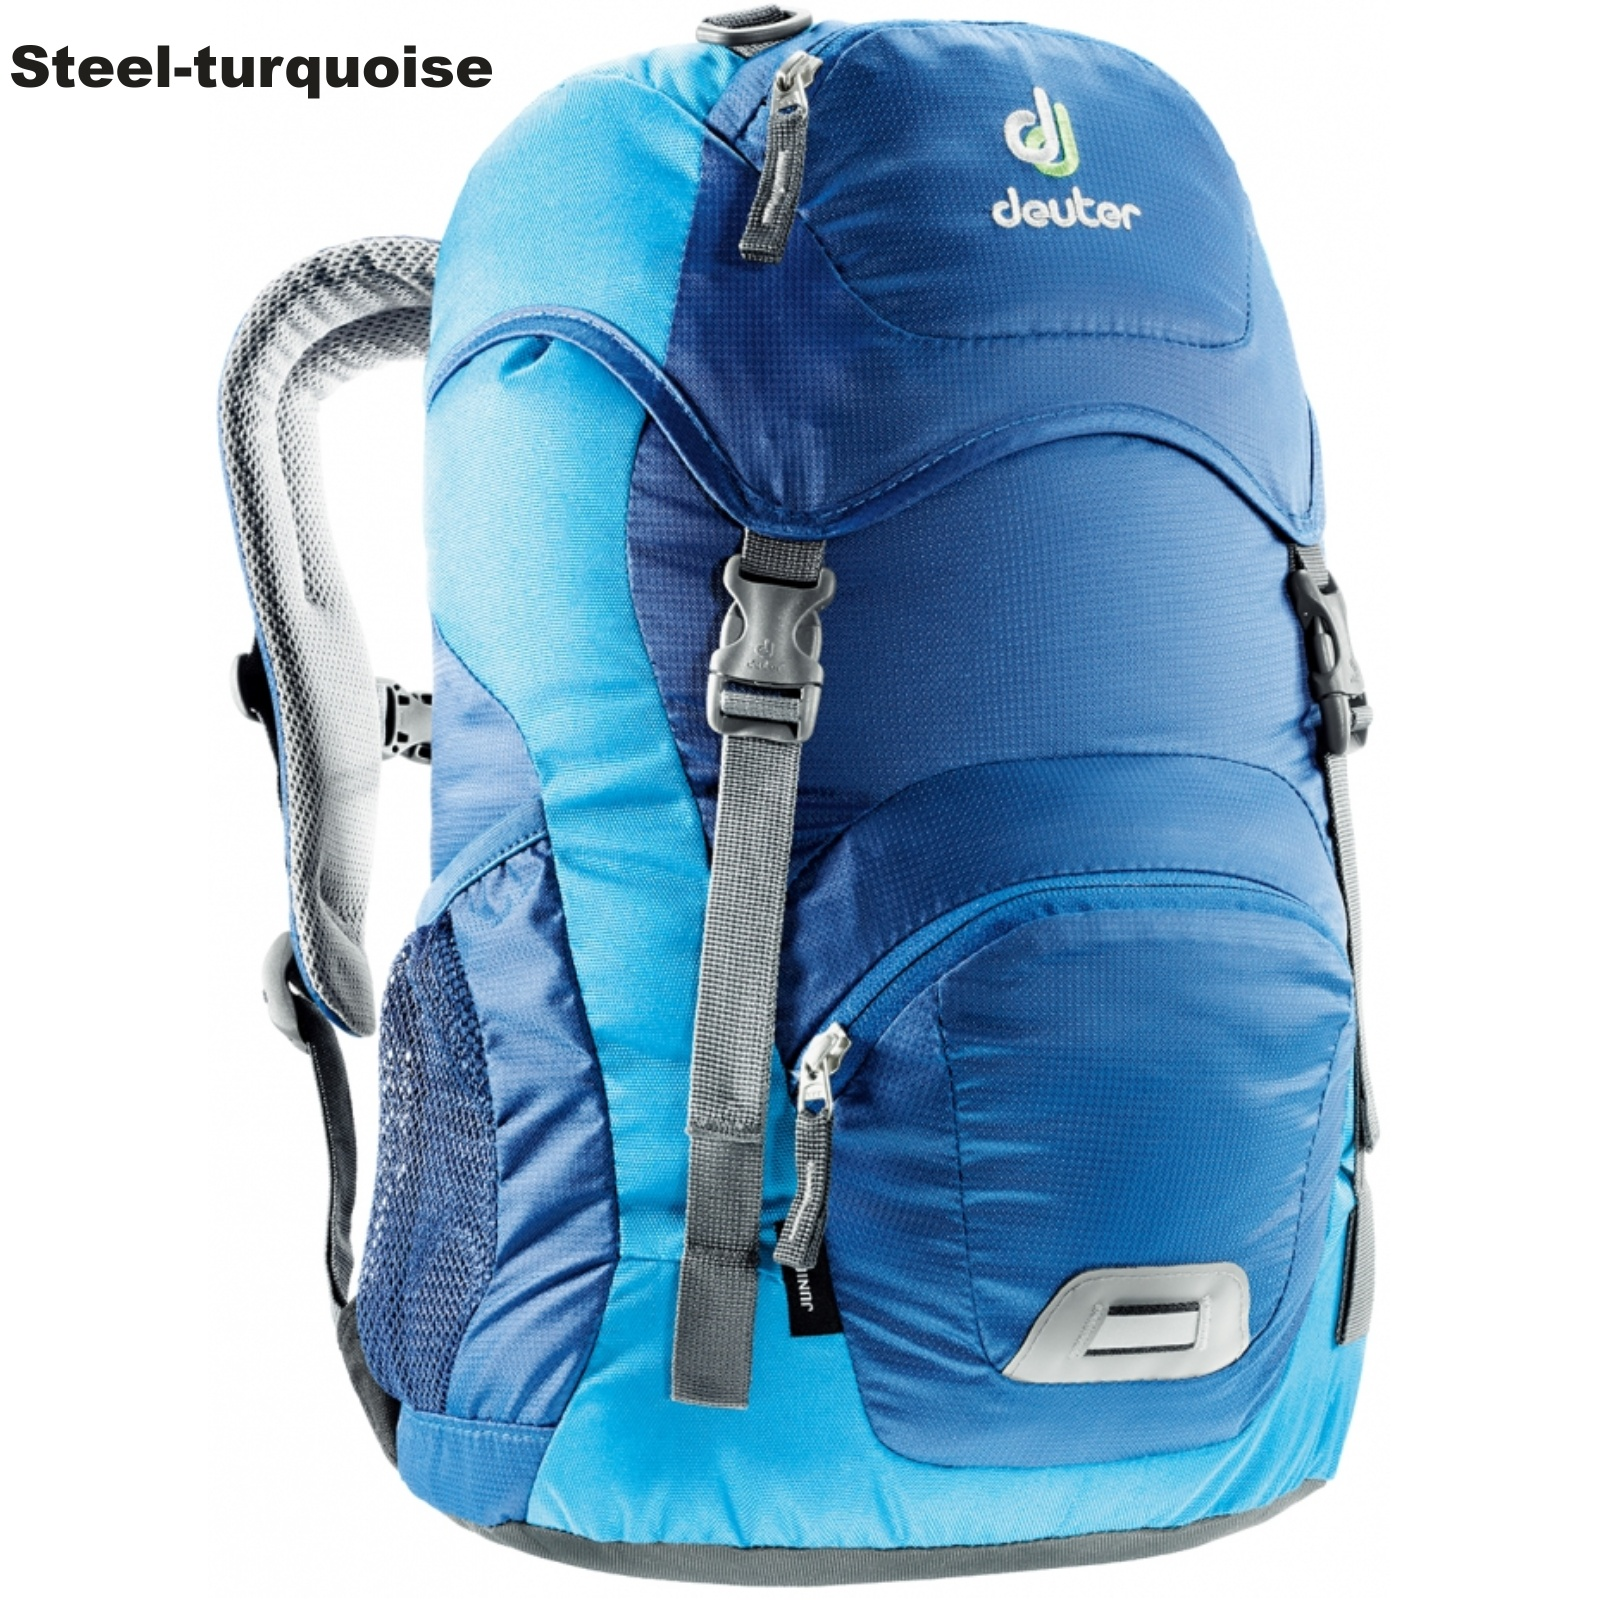 Detský batoh DEUTER Junior 18 l - steel-turquoise